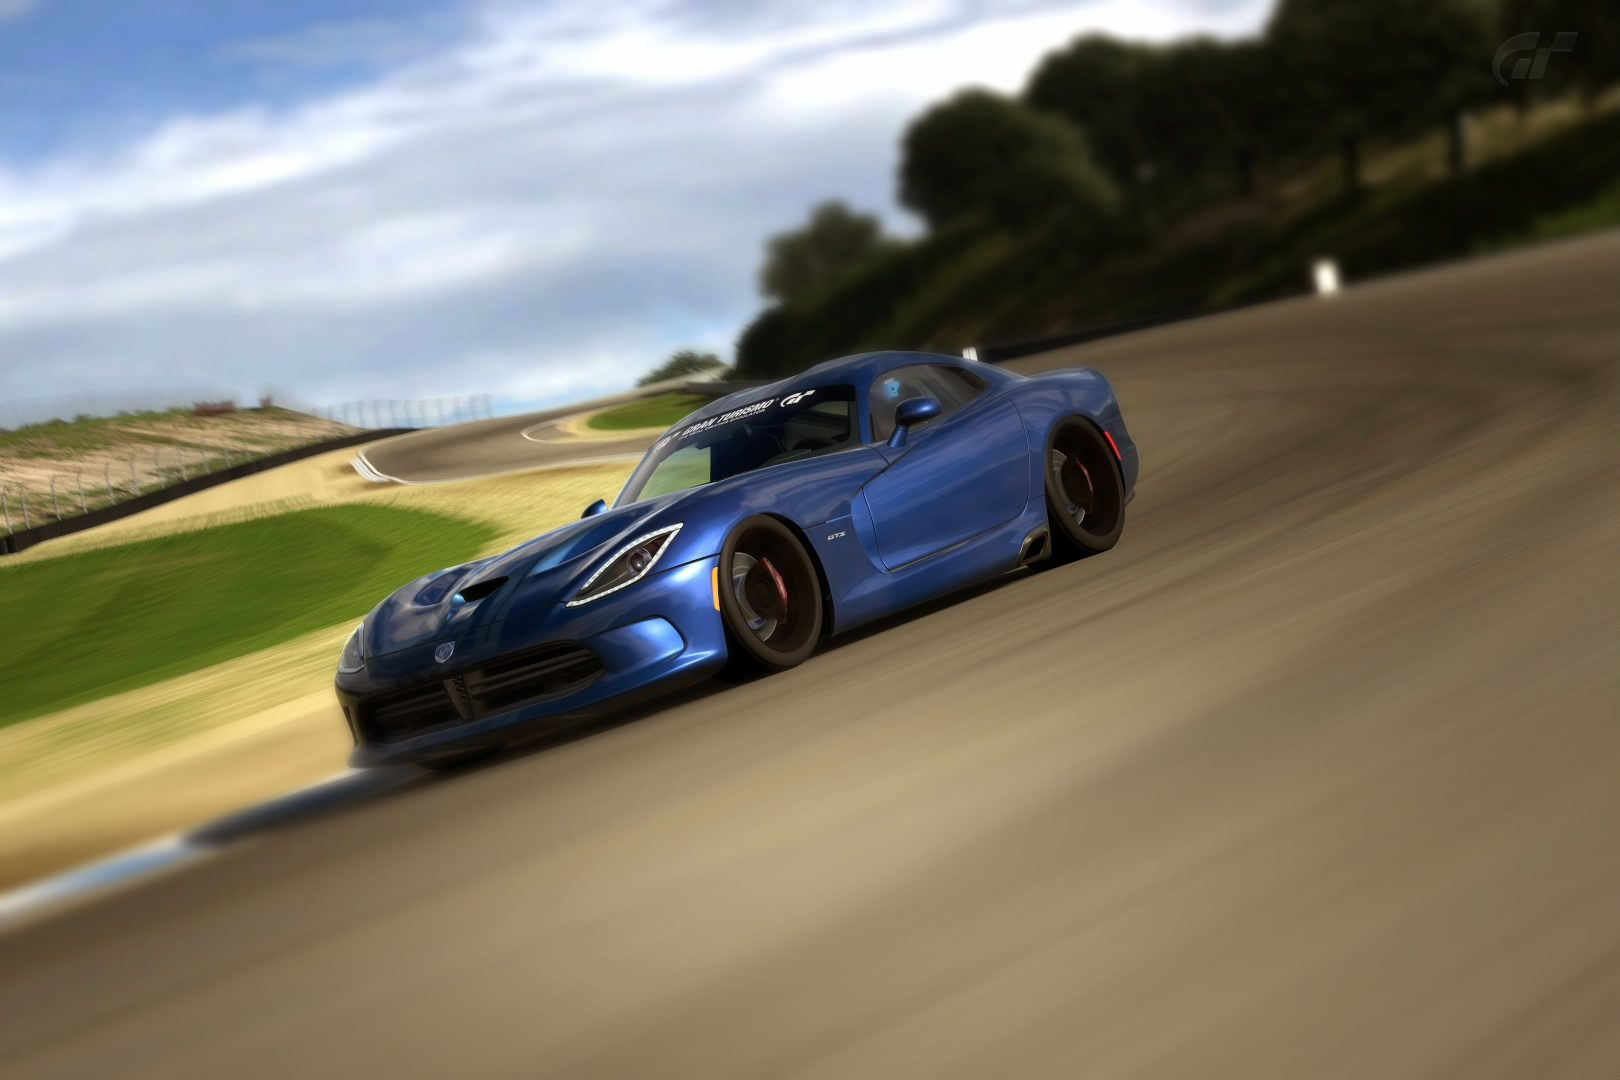 SRT Viper GTS 15th Anniv '13 (Car).jpg